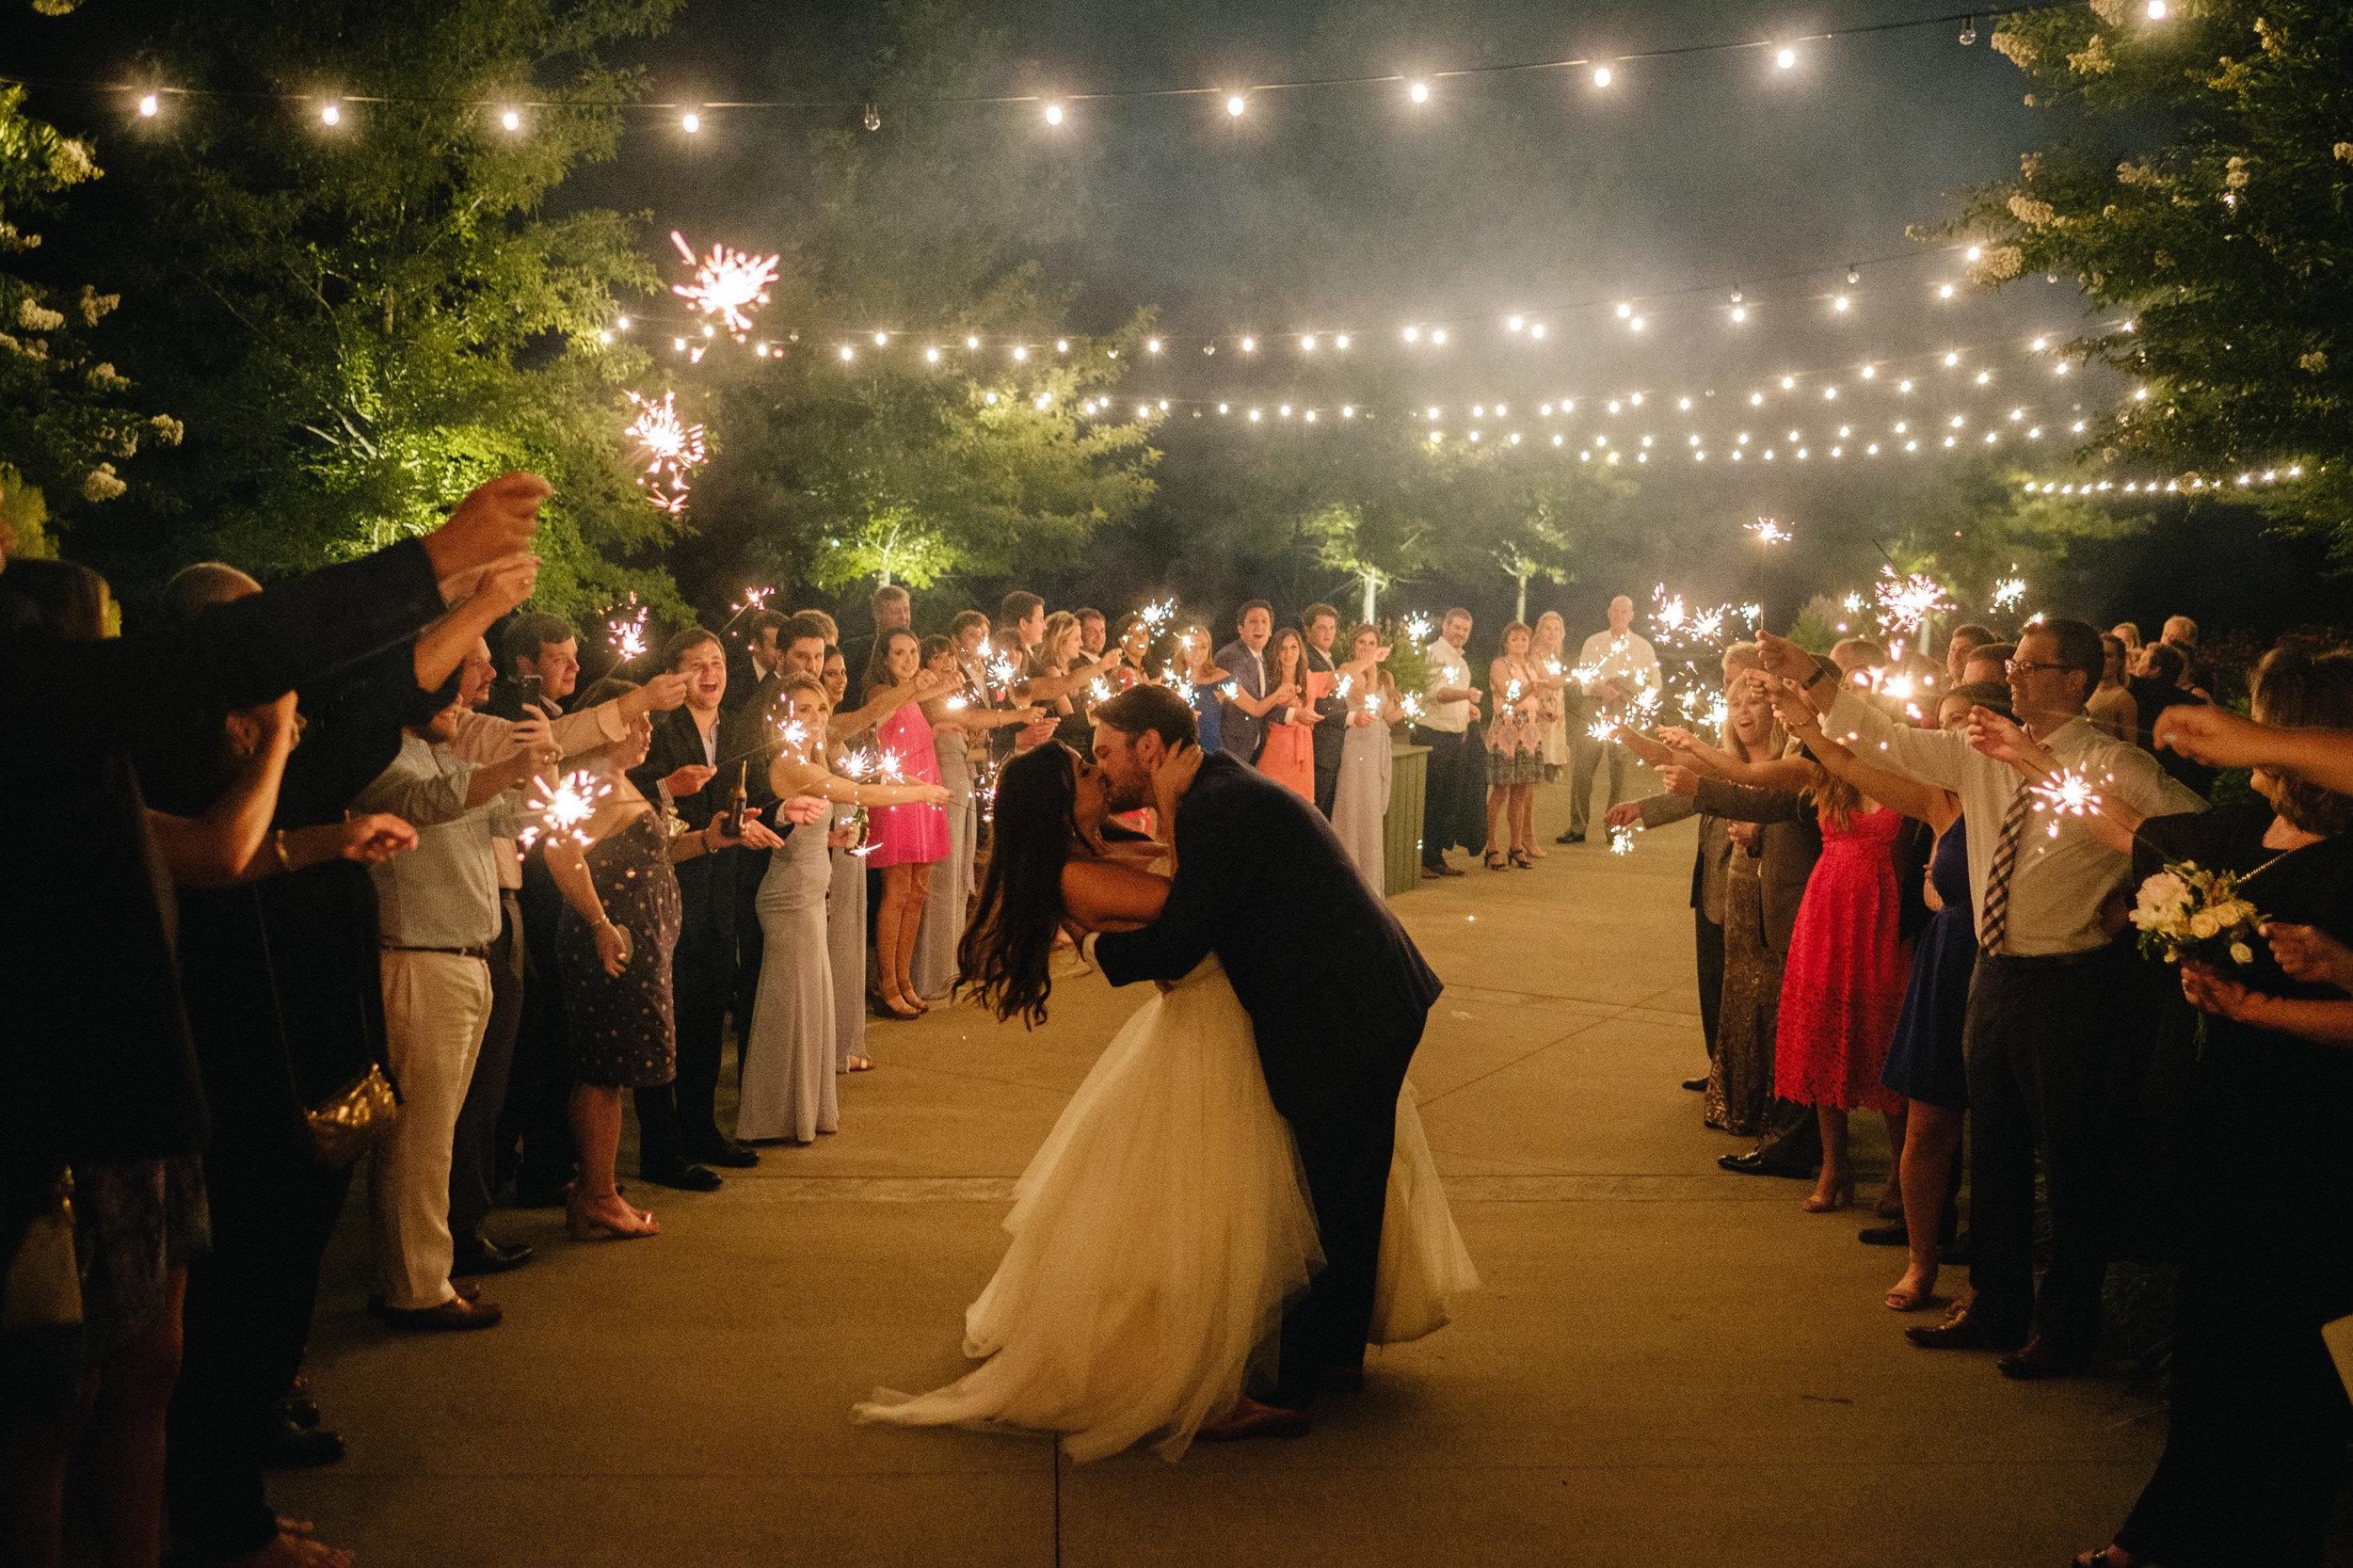 Nashville_Wedding_Photography_Mint_Springs_87.jpg